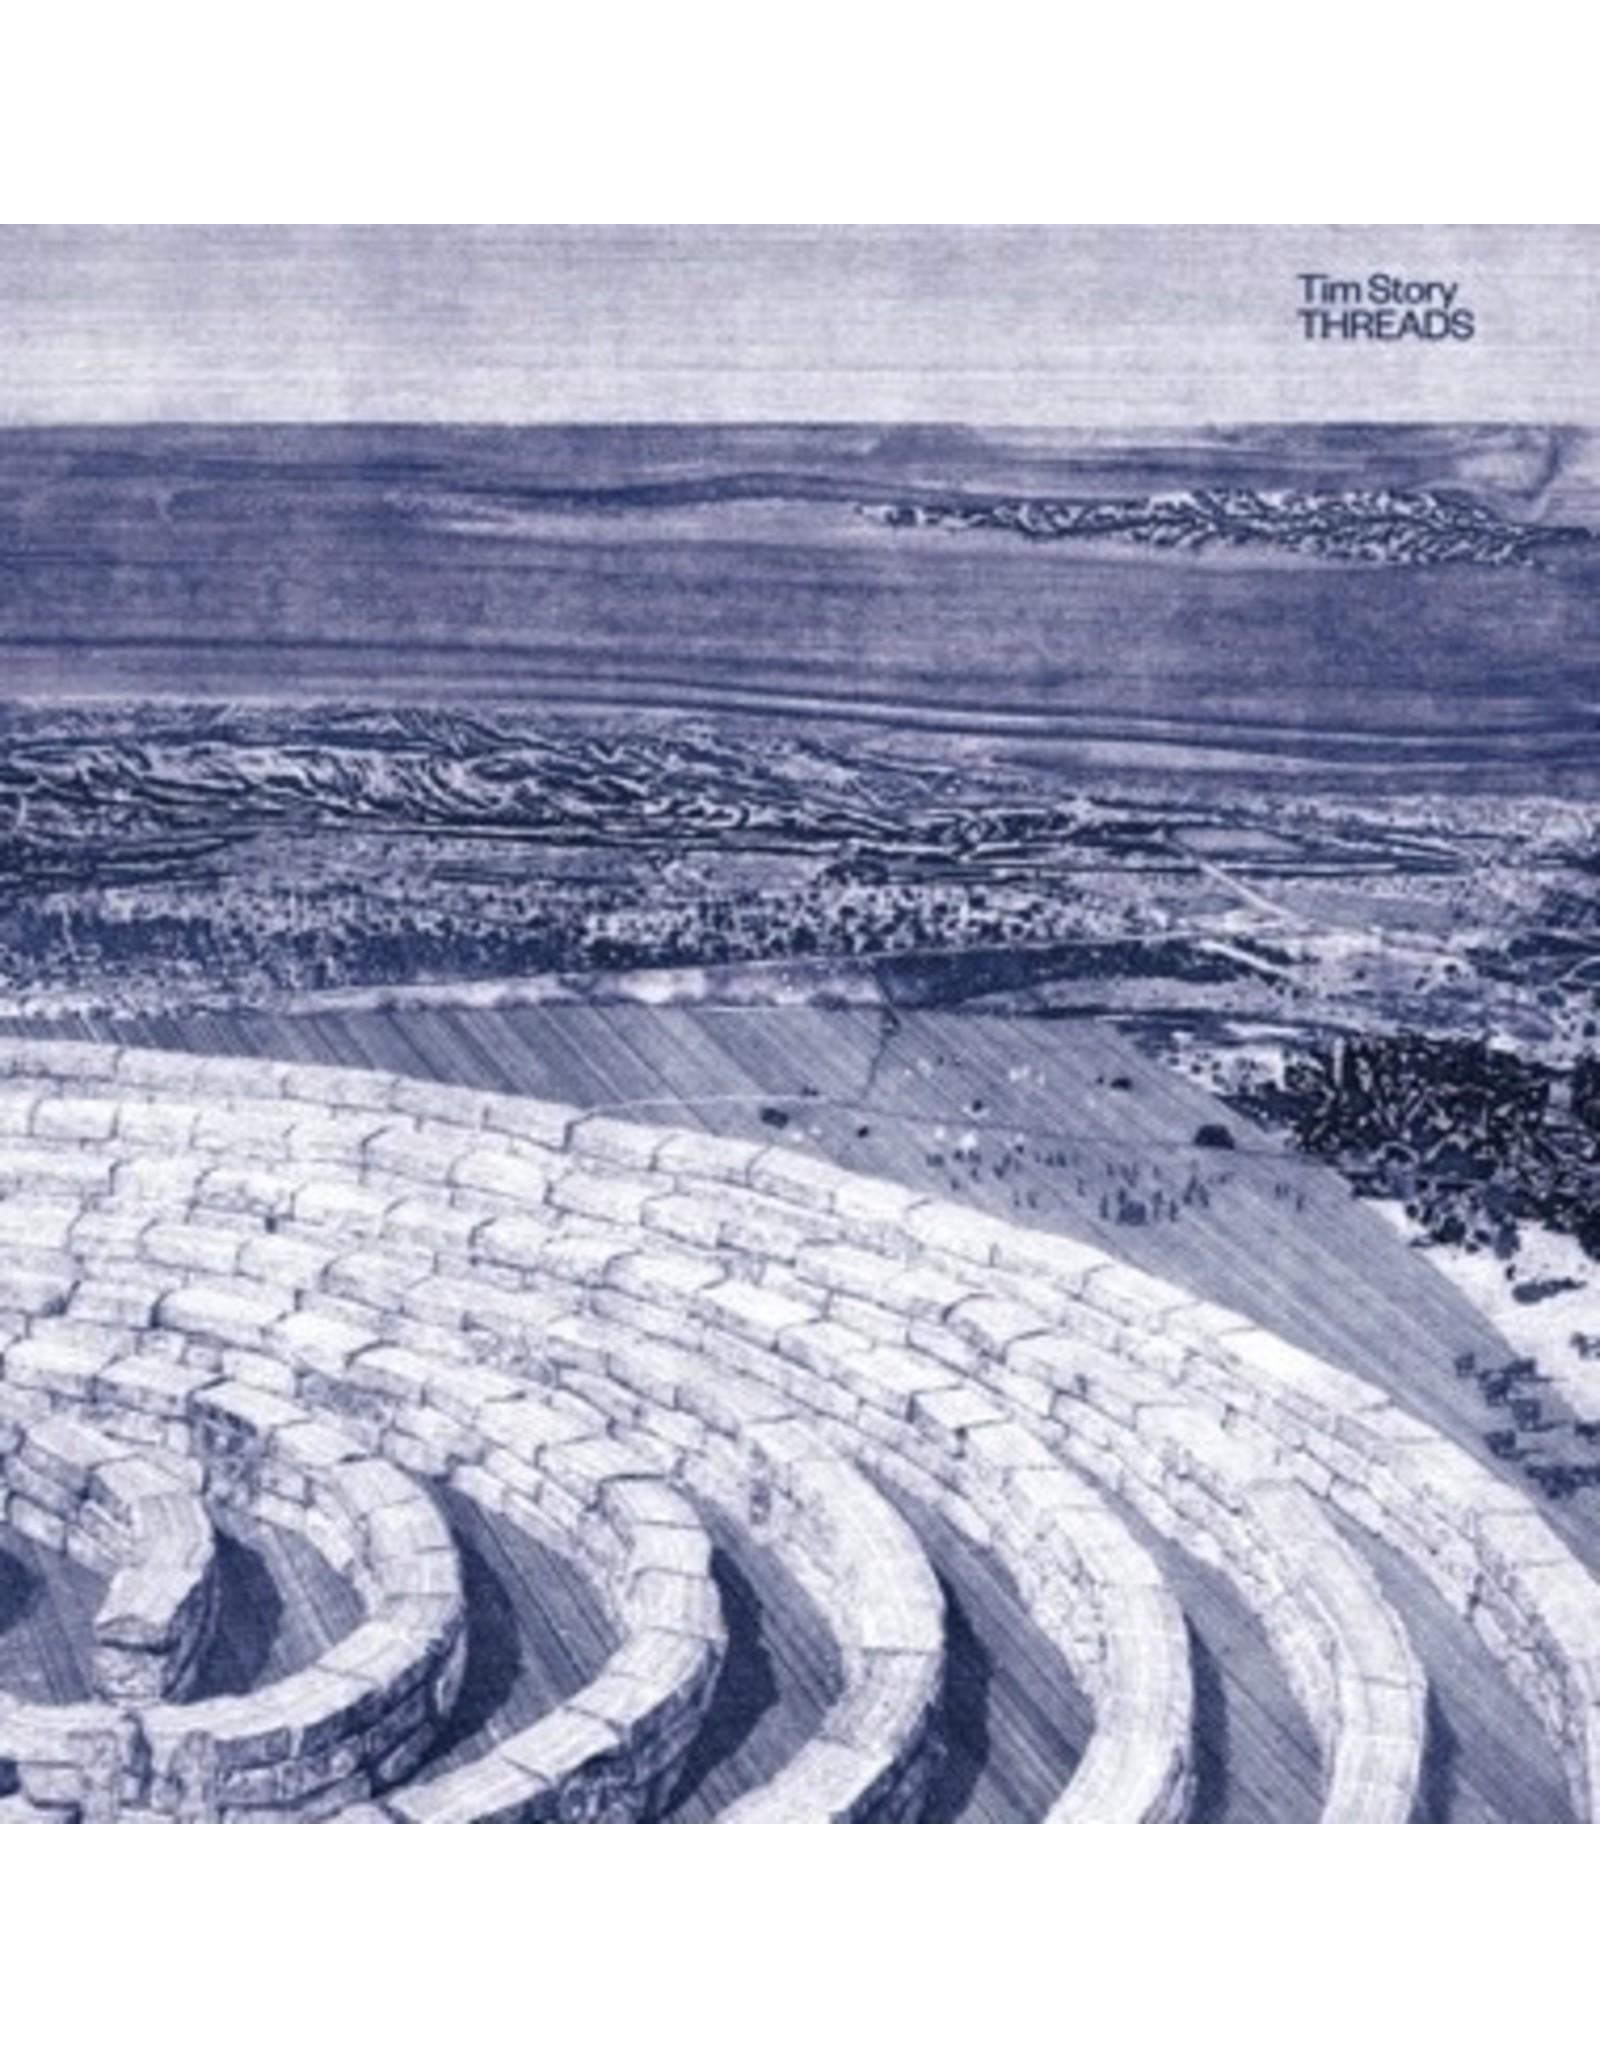 New Vinyl Tim Story - Threads (Colored) LP